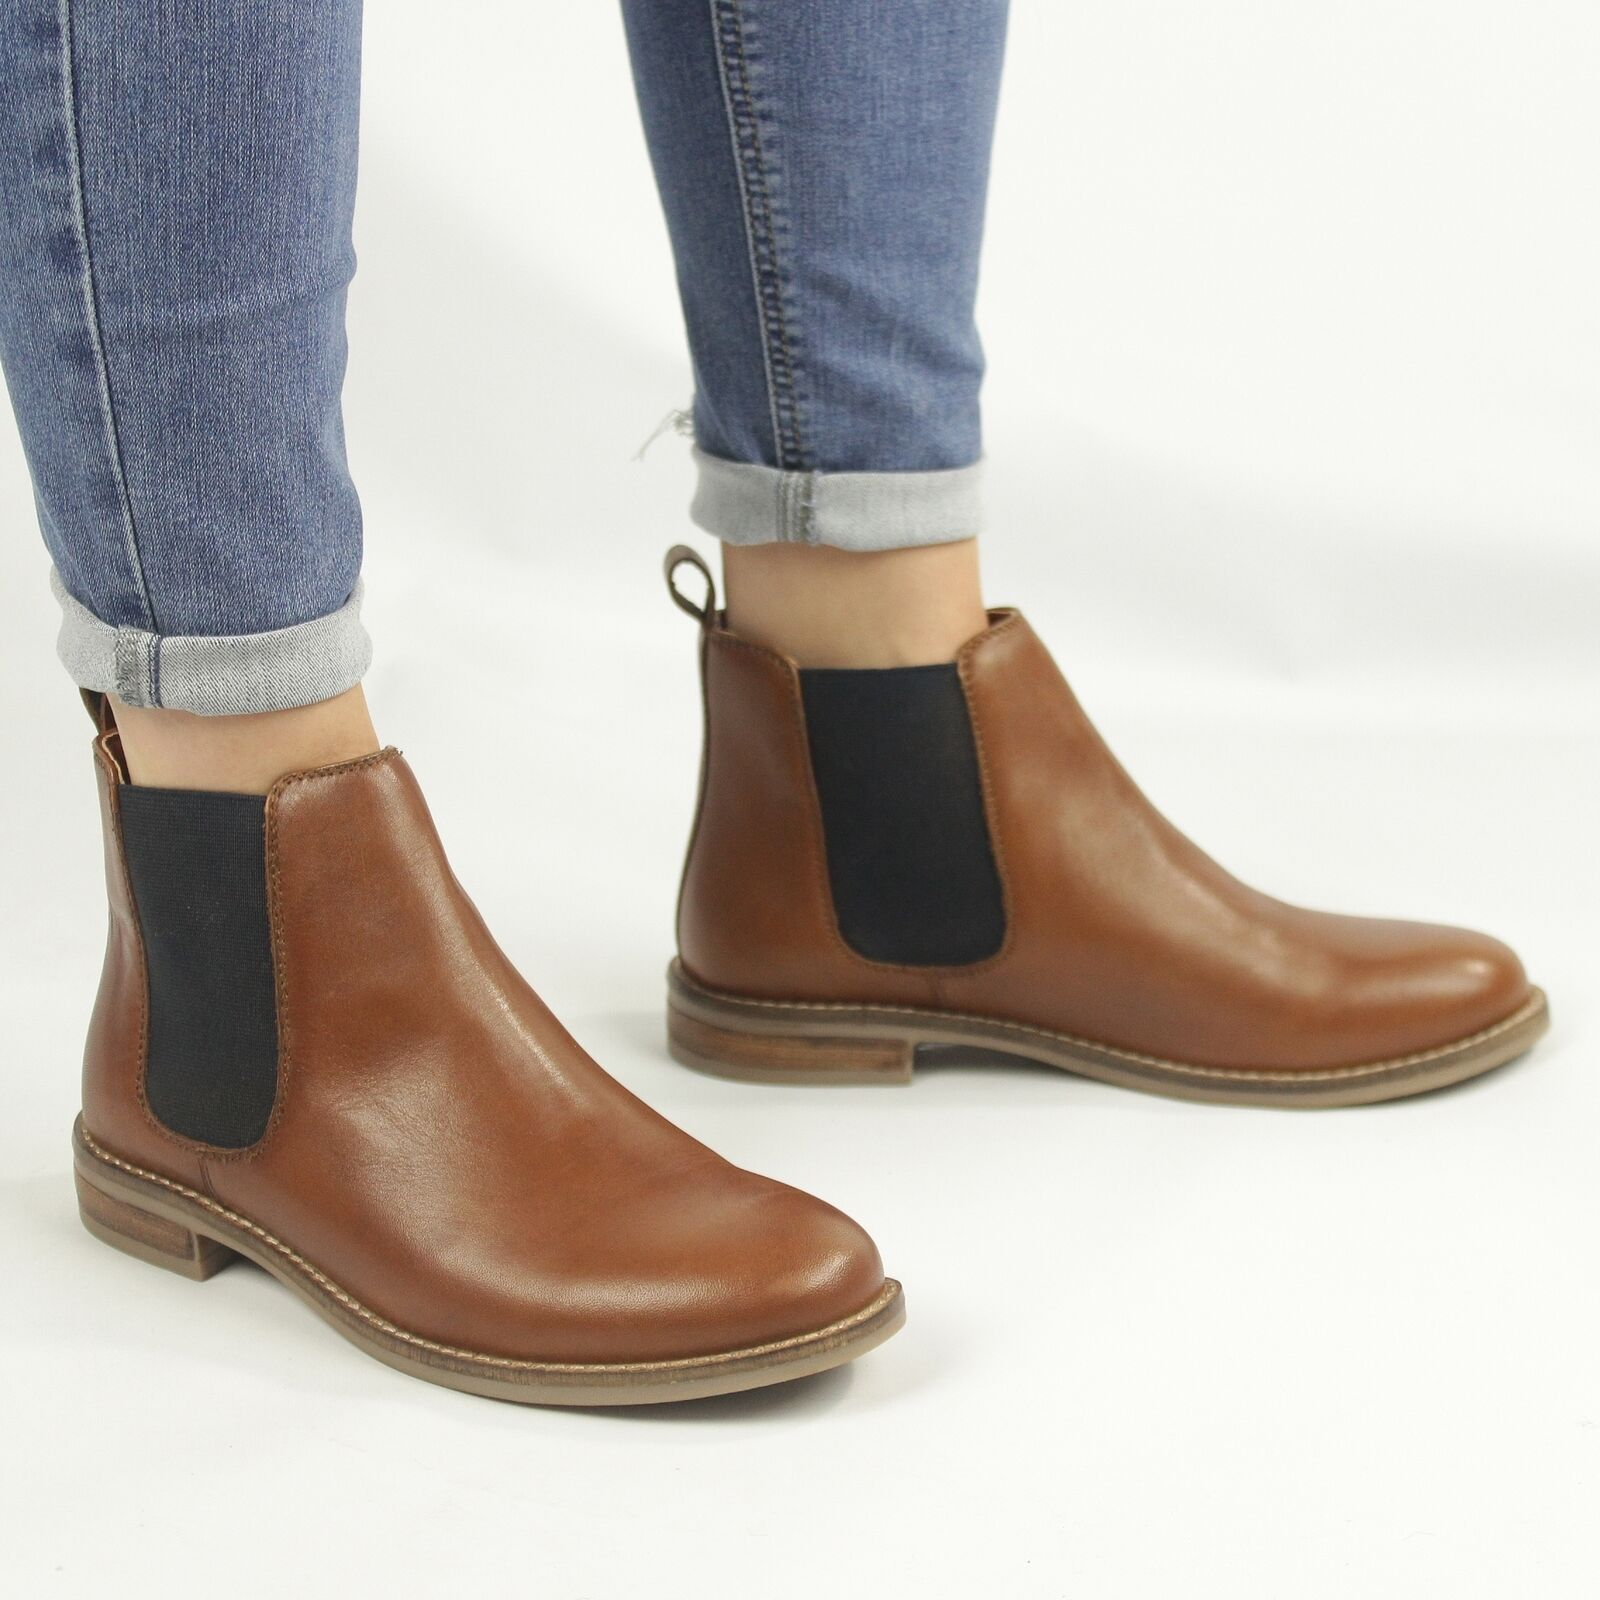 Shumo ALEXANDRA Ladies Womens Leather Dual Gusset Slip On Chelsea Boots Cognac